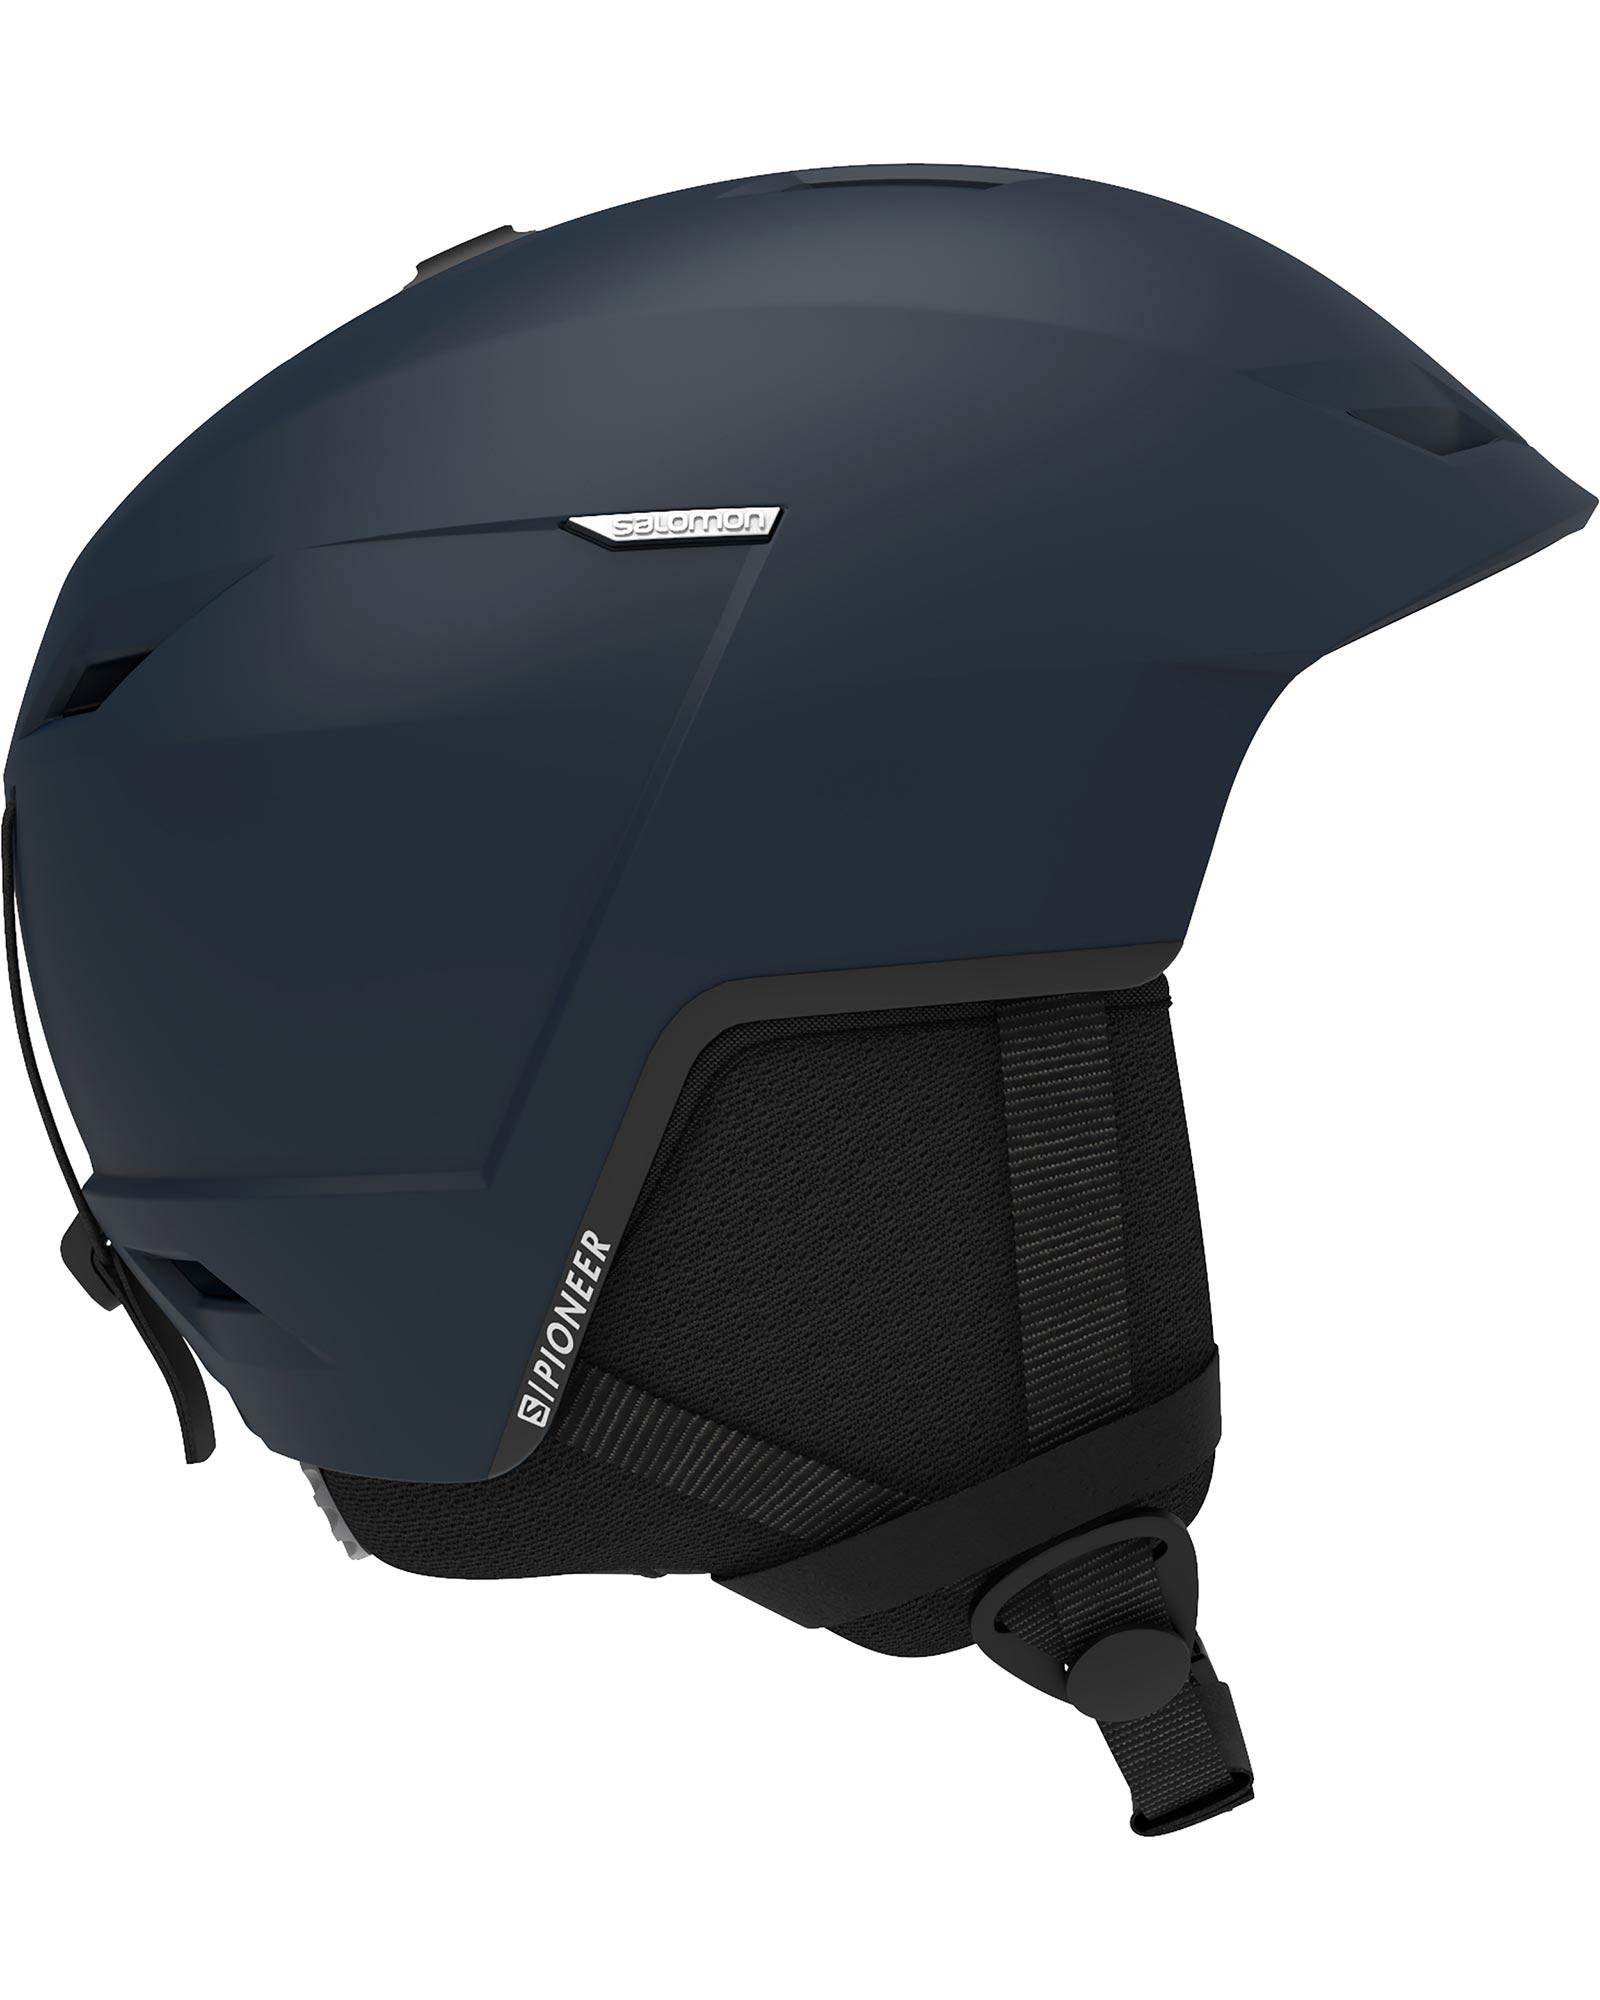 Salomon Pioneer LT Snowsports Helmet 2020 / 2021 0